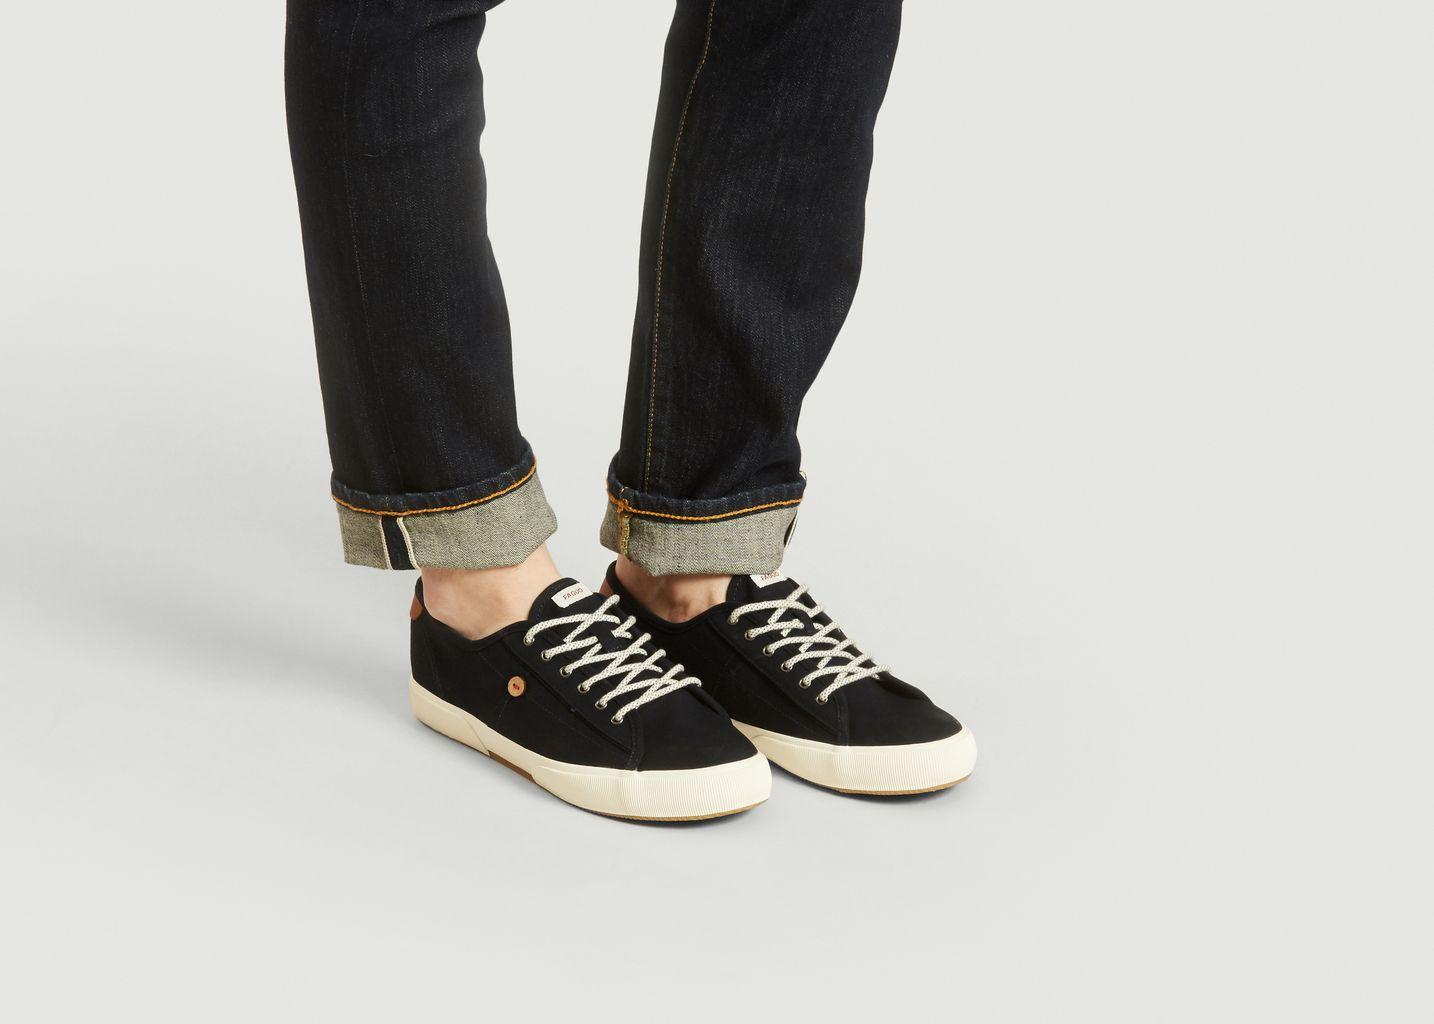 Bleu Faguo À 40 L'exception Sneakers Marine Birch Soldes SxwEqFBaB